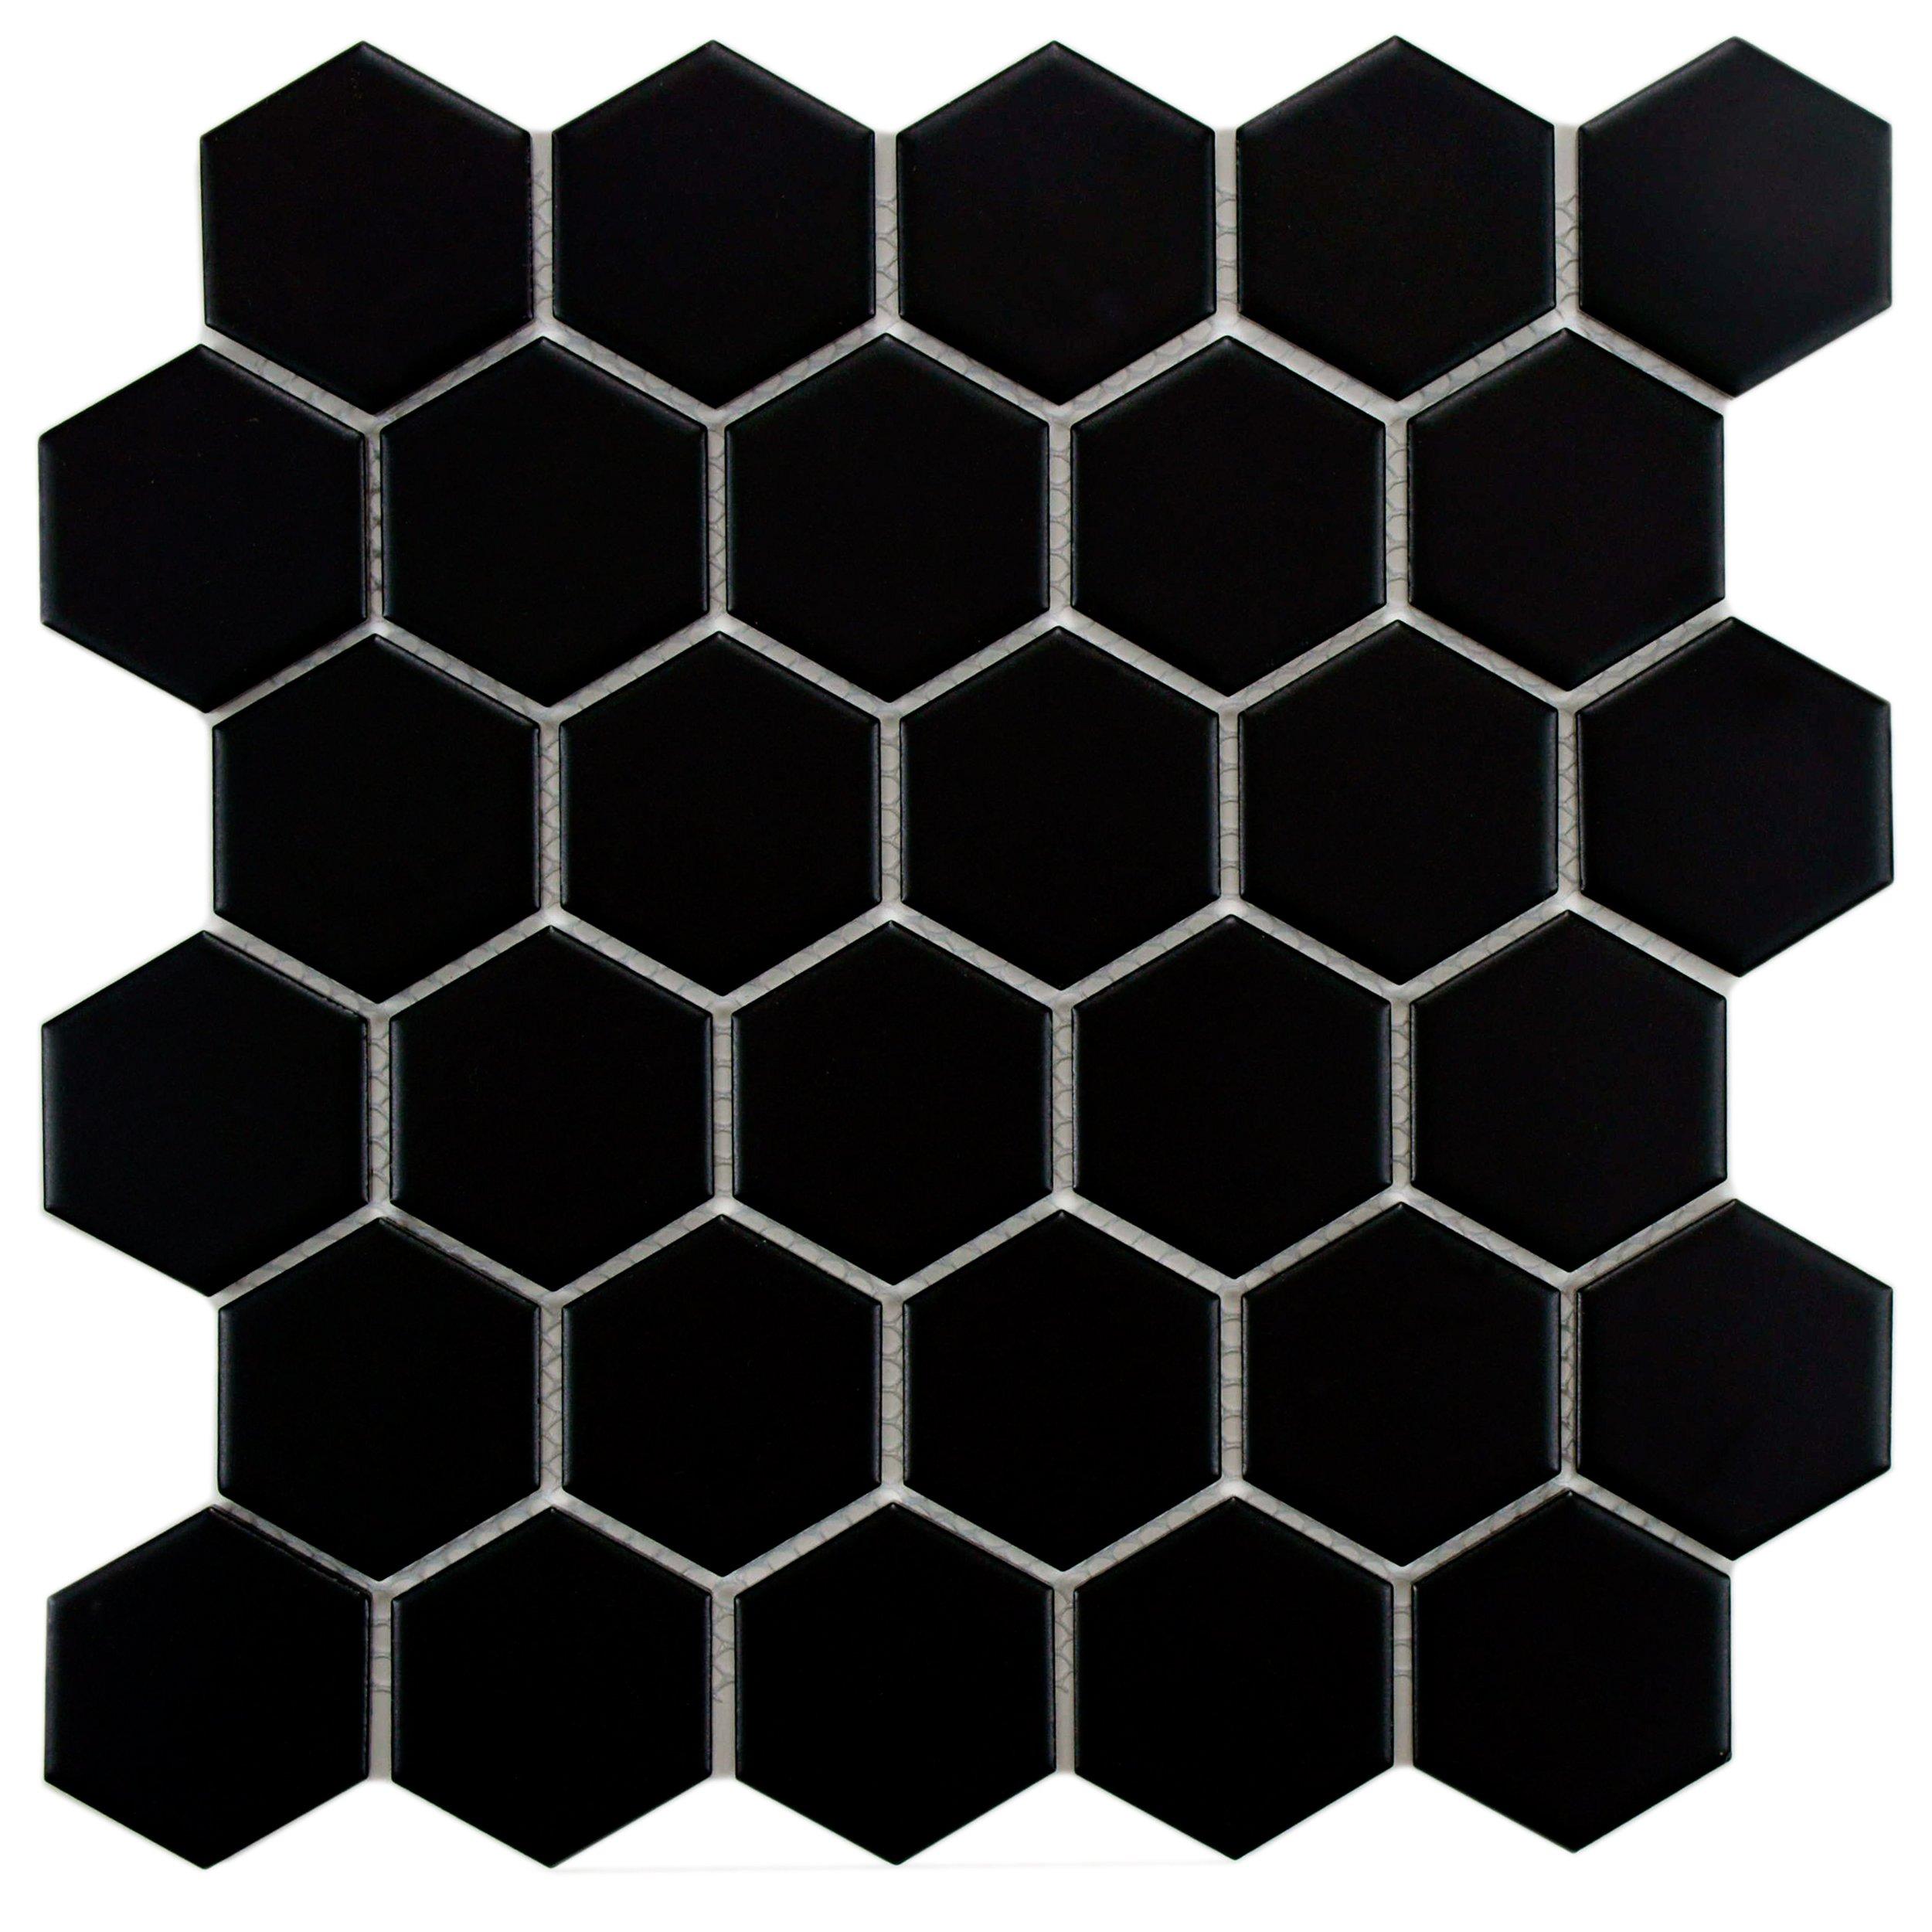 SomerTile FXLM2HMB Retro Hex Porcelain Floor and Wall Tile, 10.5'' x 11'', Matte Black